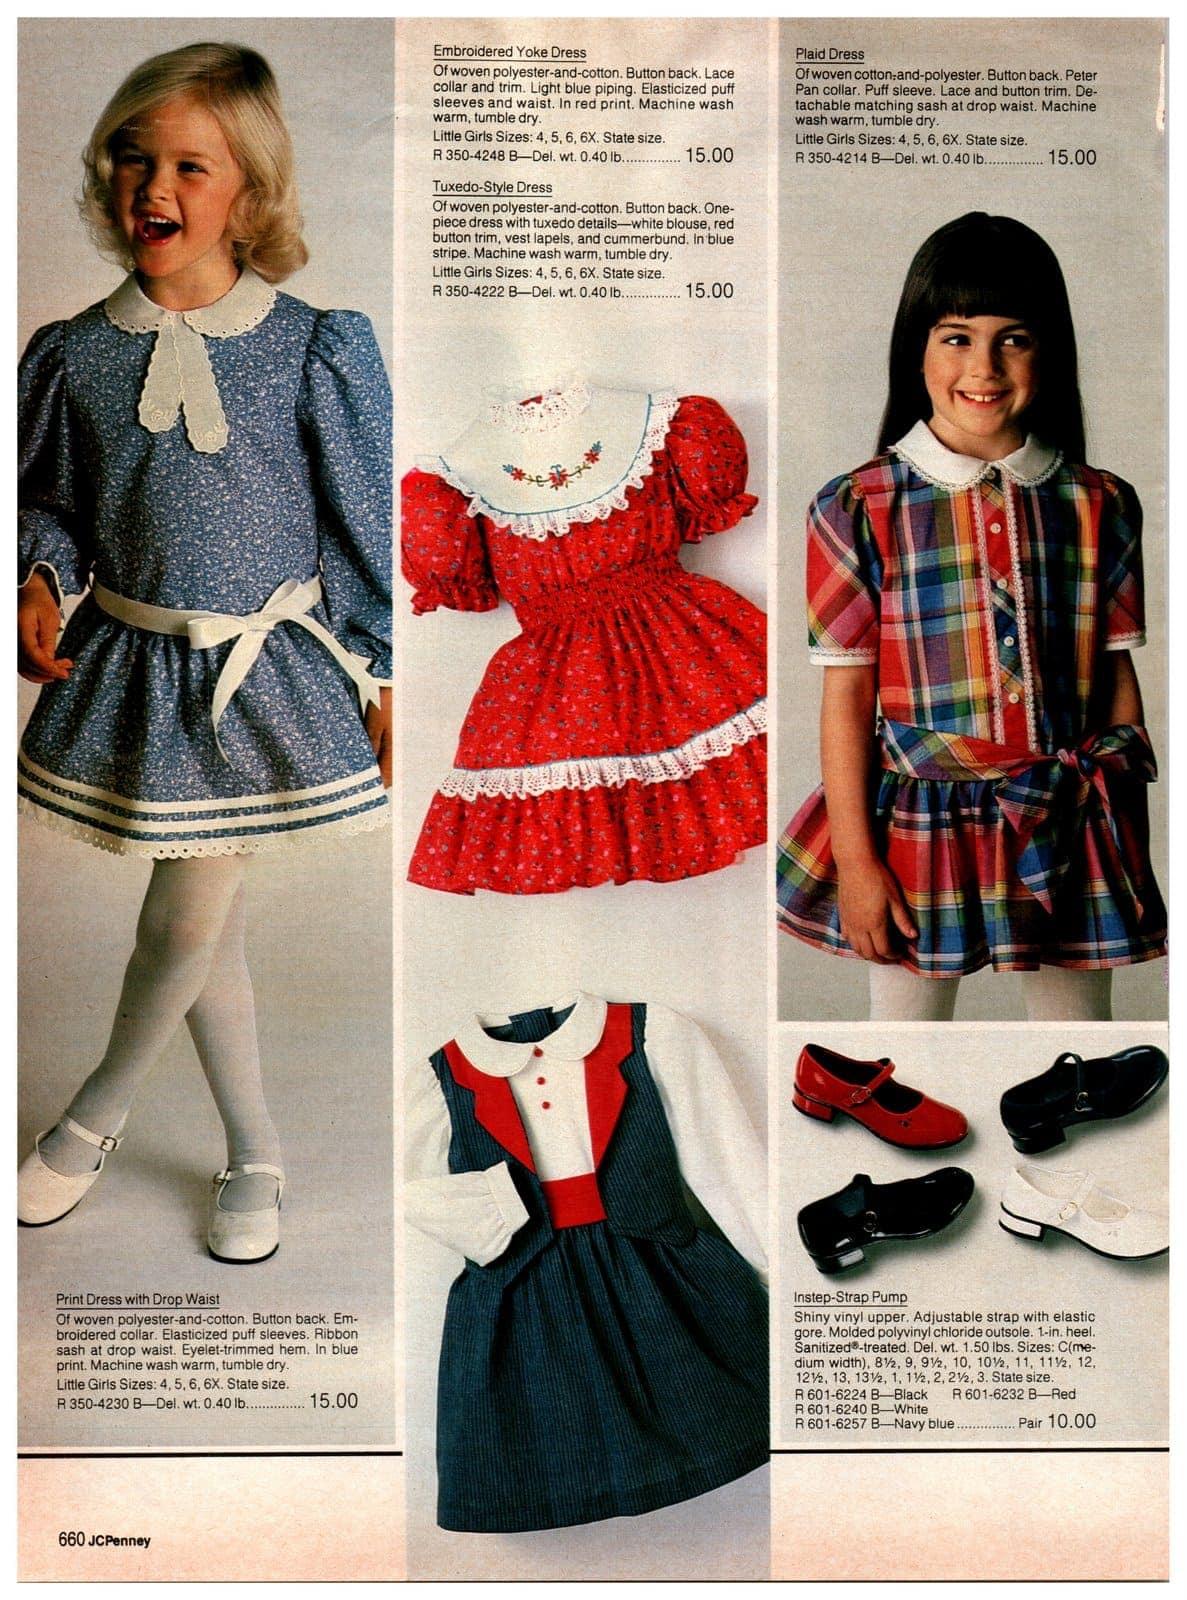 Fancy vintage '80s clothing for little girls